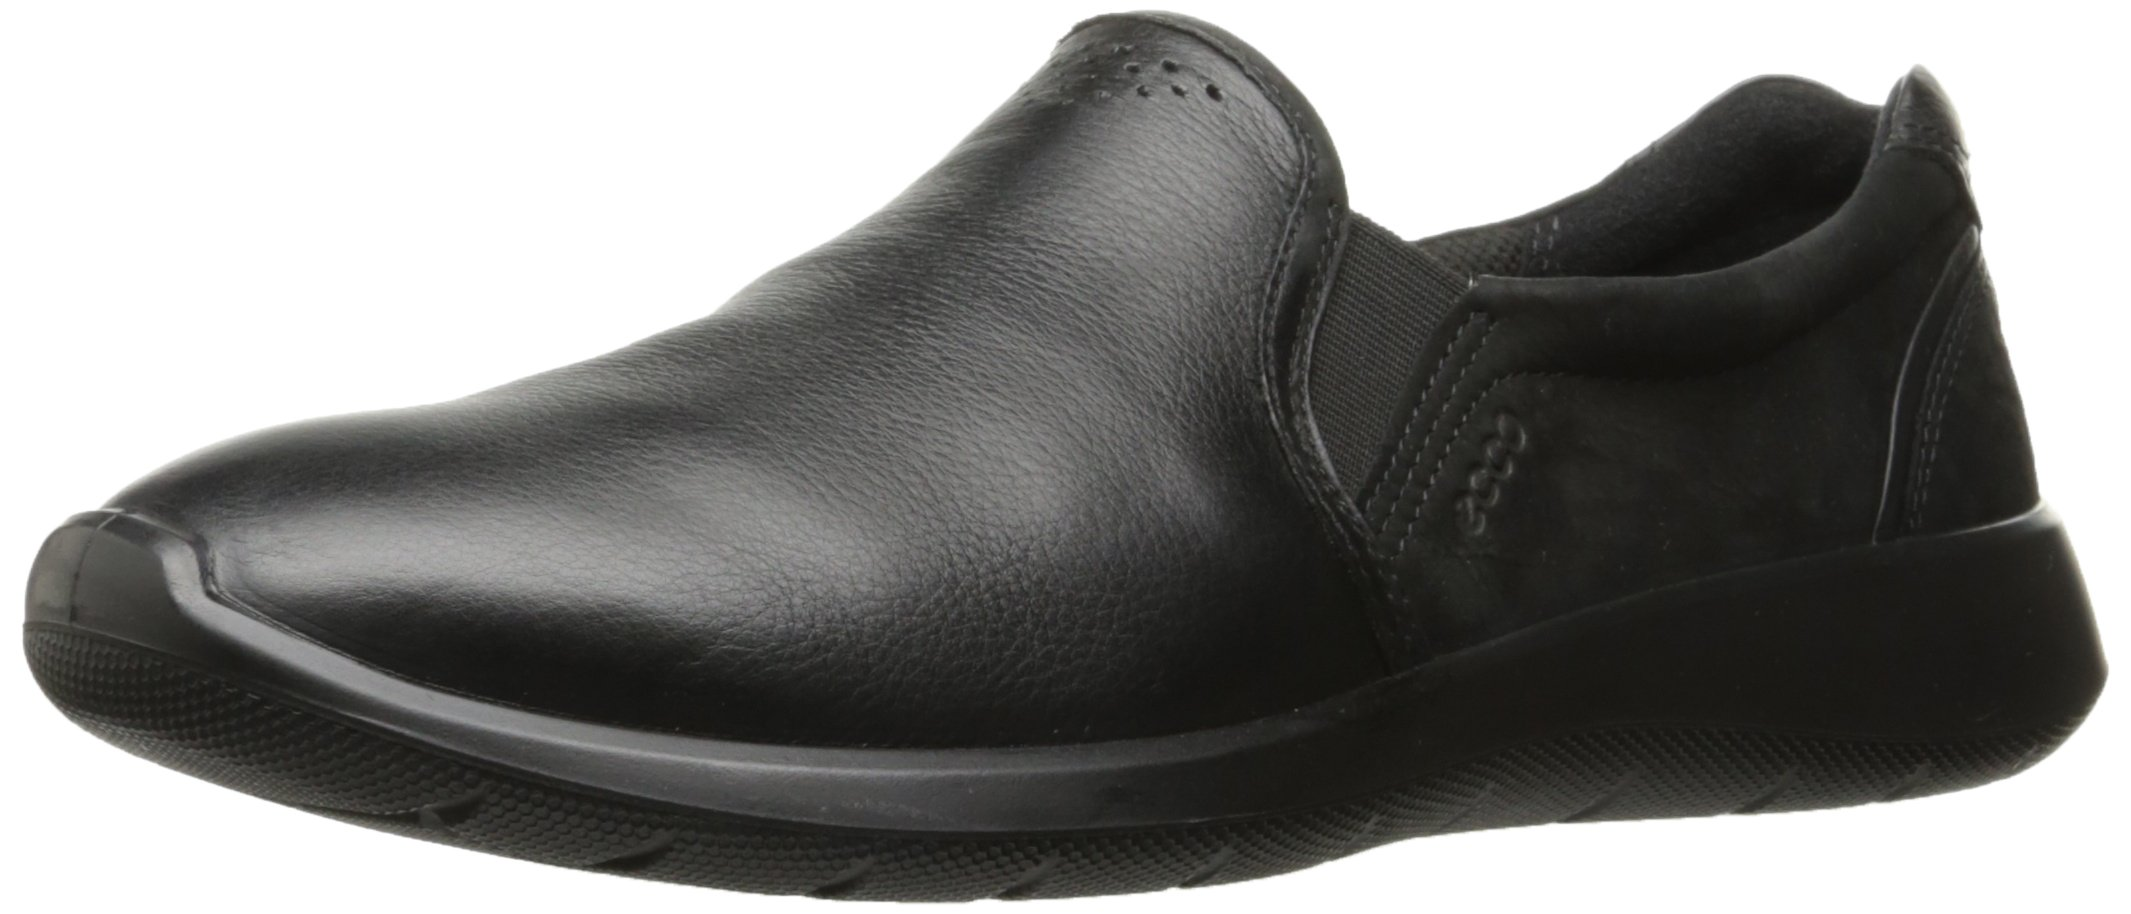 ECCO Women's Women's Soft 5 Slip On Fashion Sneaker, Black/Black, 39 EU/8-8.5 US